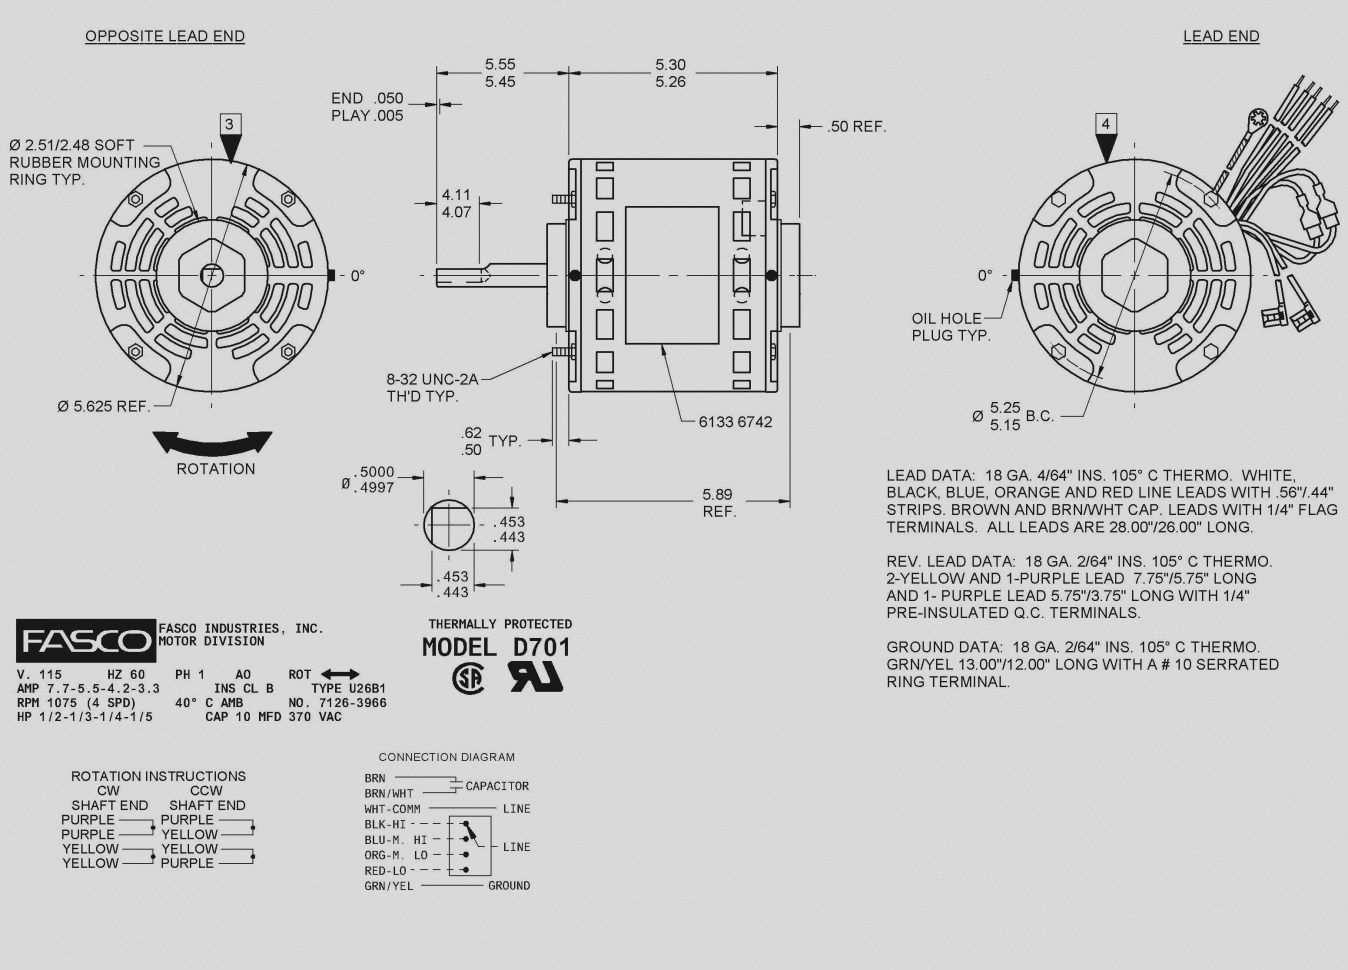 Mars 10464 Wiring Diagram - Wiring Diagram Daewoo Nubira 2 -  tomosa35.fiat-3600.decorresine.itWiring Diagram Resource